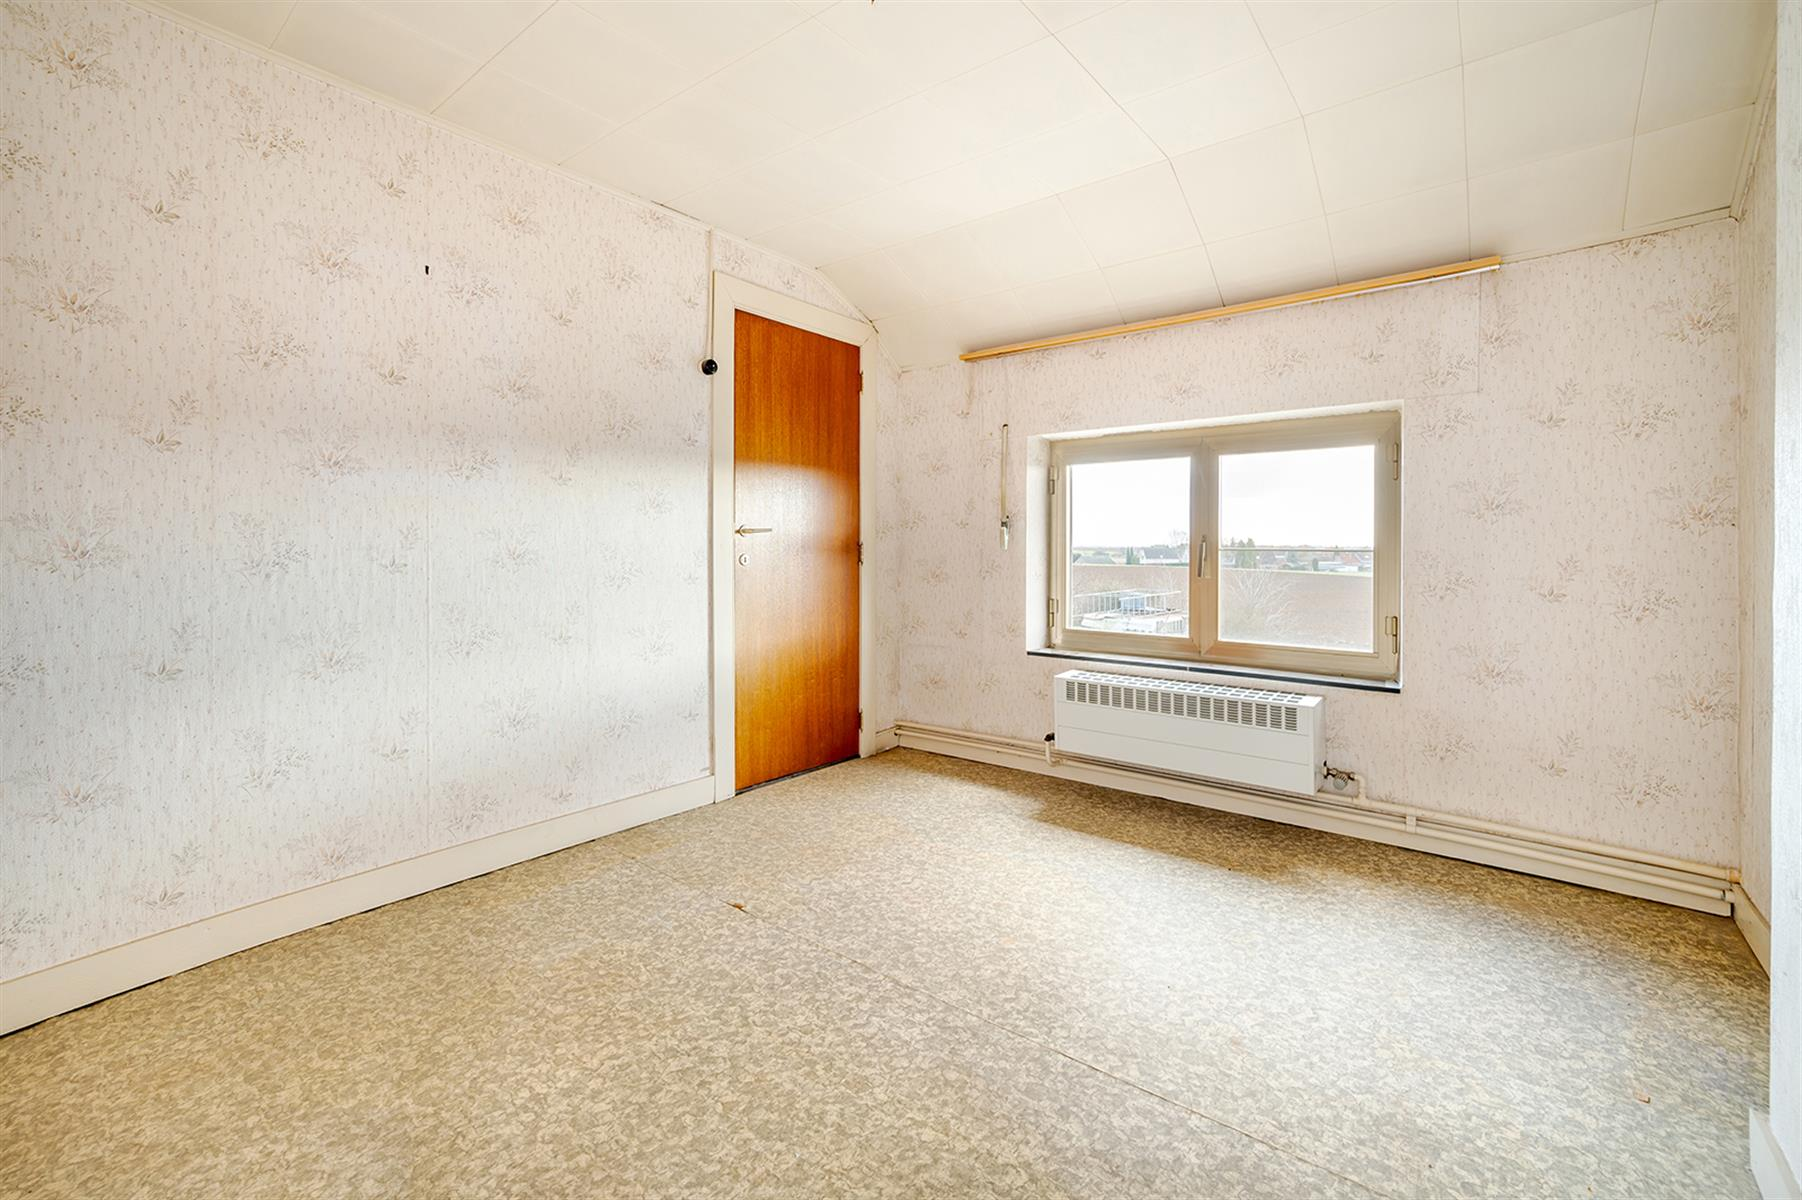 Maison - Remicourt - #4293207-16